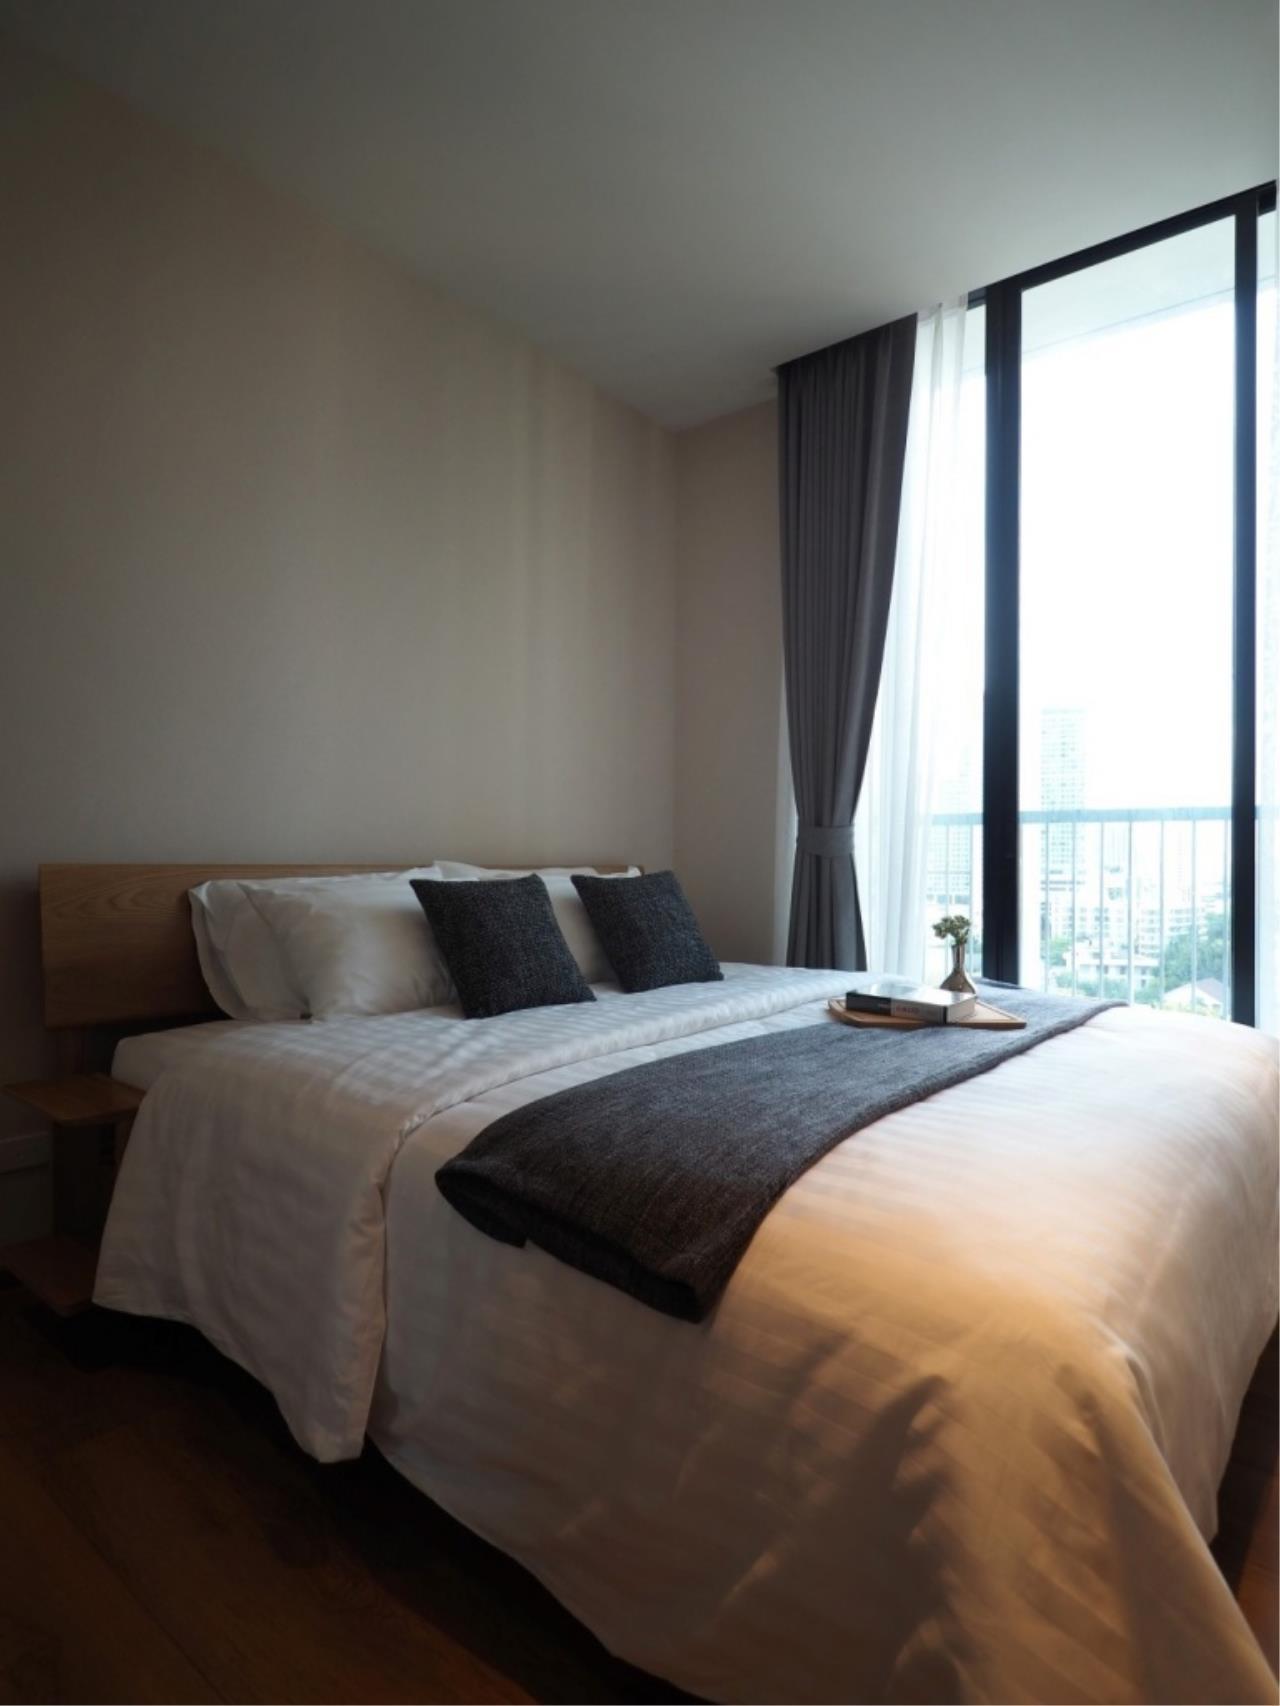 Century21 Skylux Agency's Park 24 / Condo For Rent / 2 Bedroom / 53.53 SQM / BTS Phrom Phong / Bangkok 8